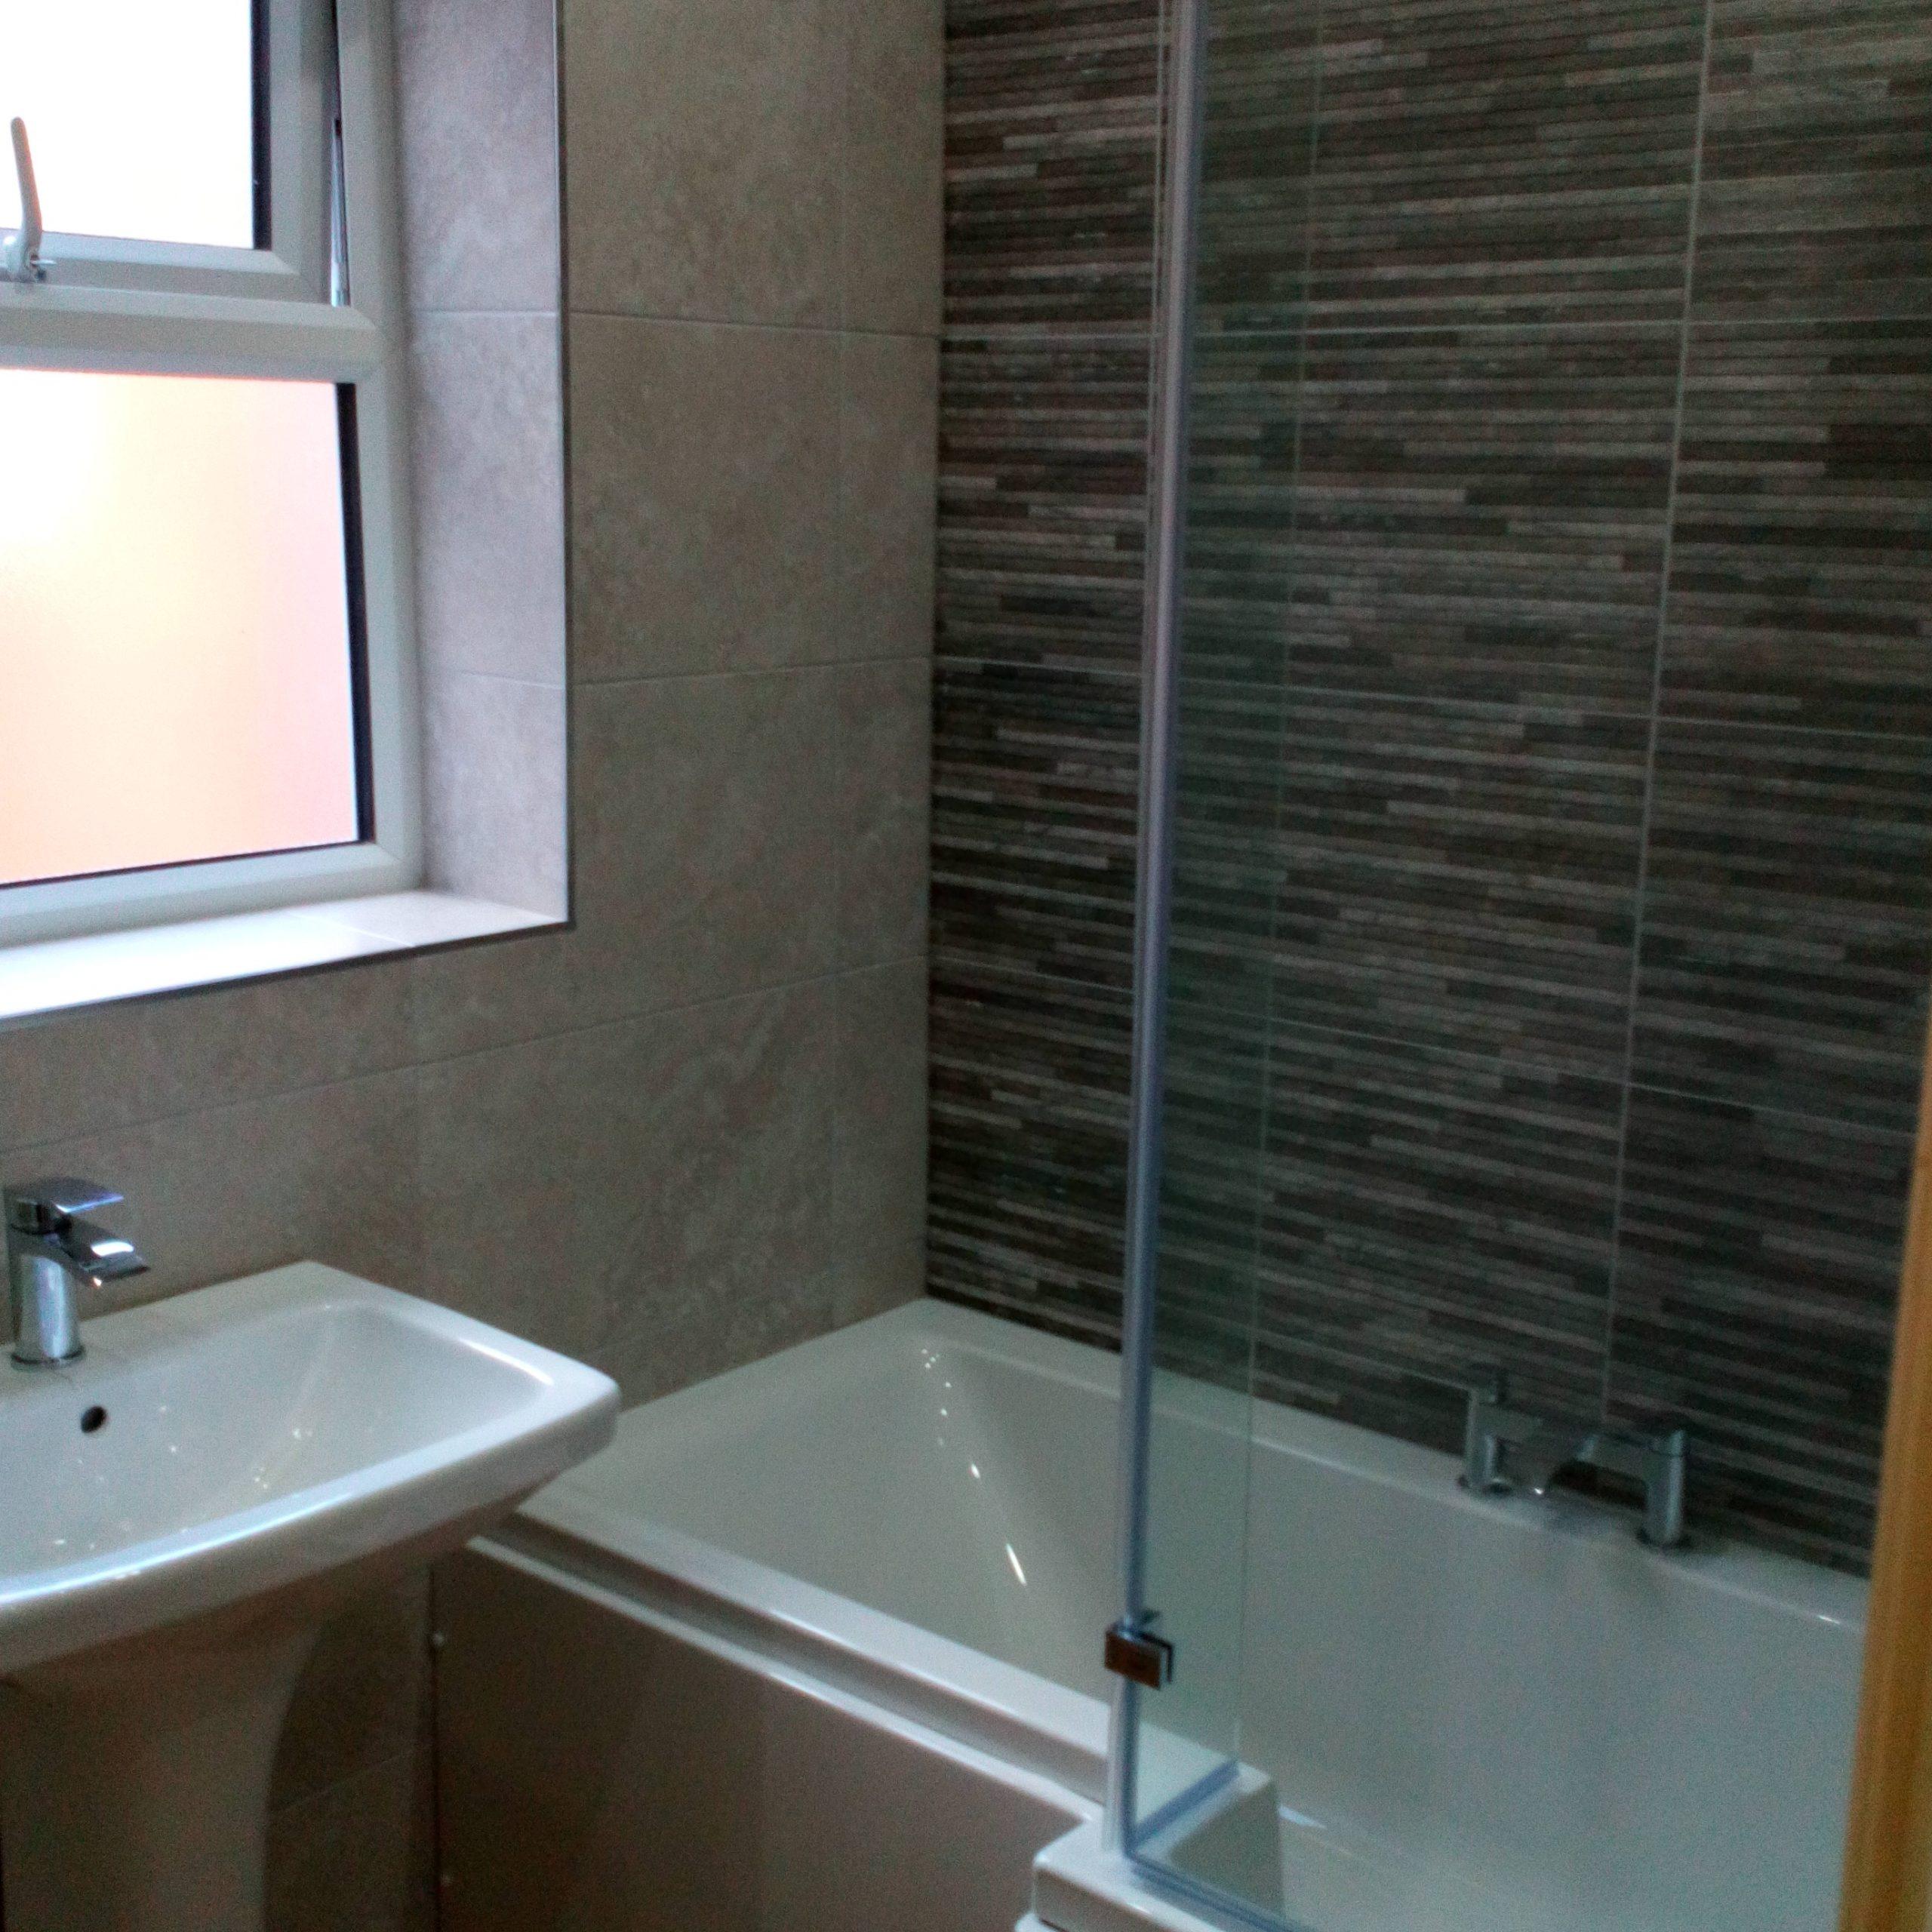 St. Alban's Bathroom